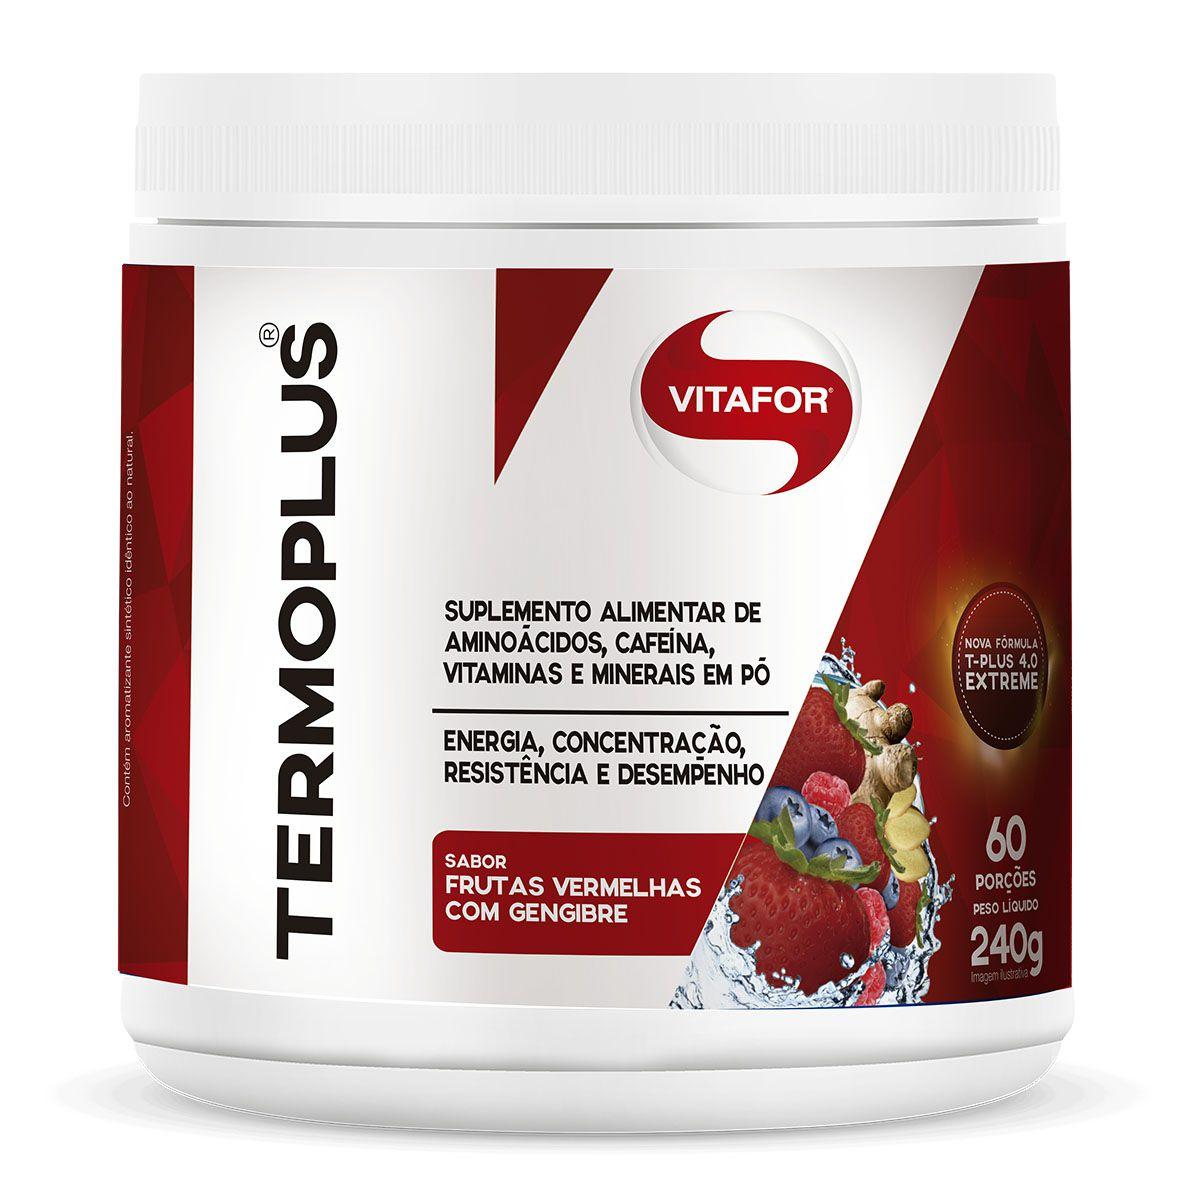 Termo Plus 240g - Vitafor